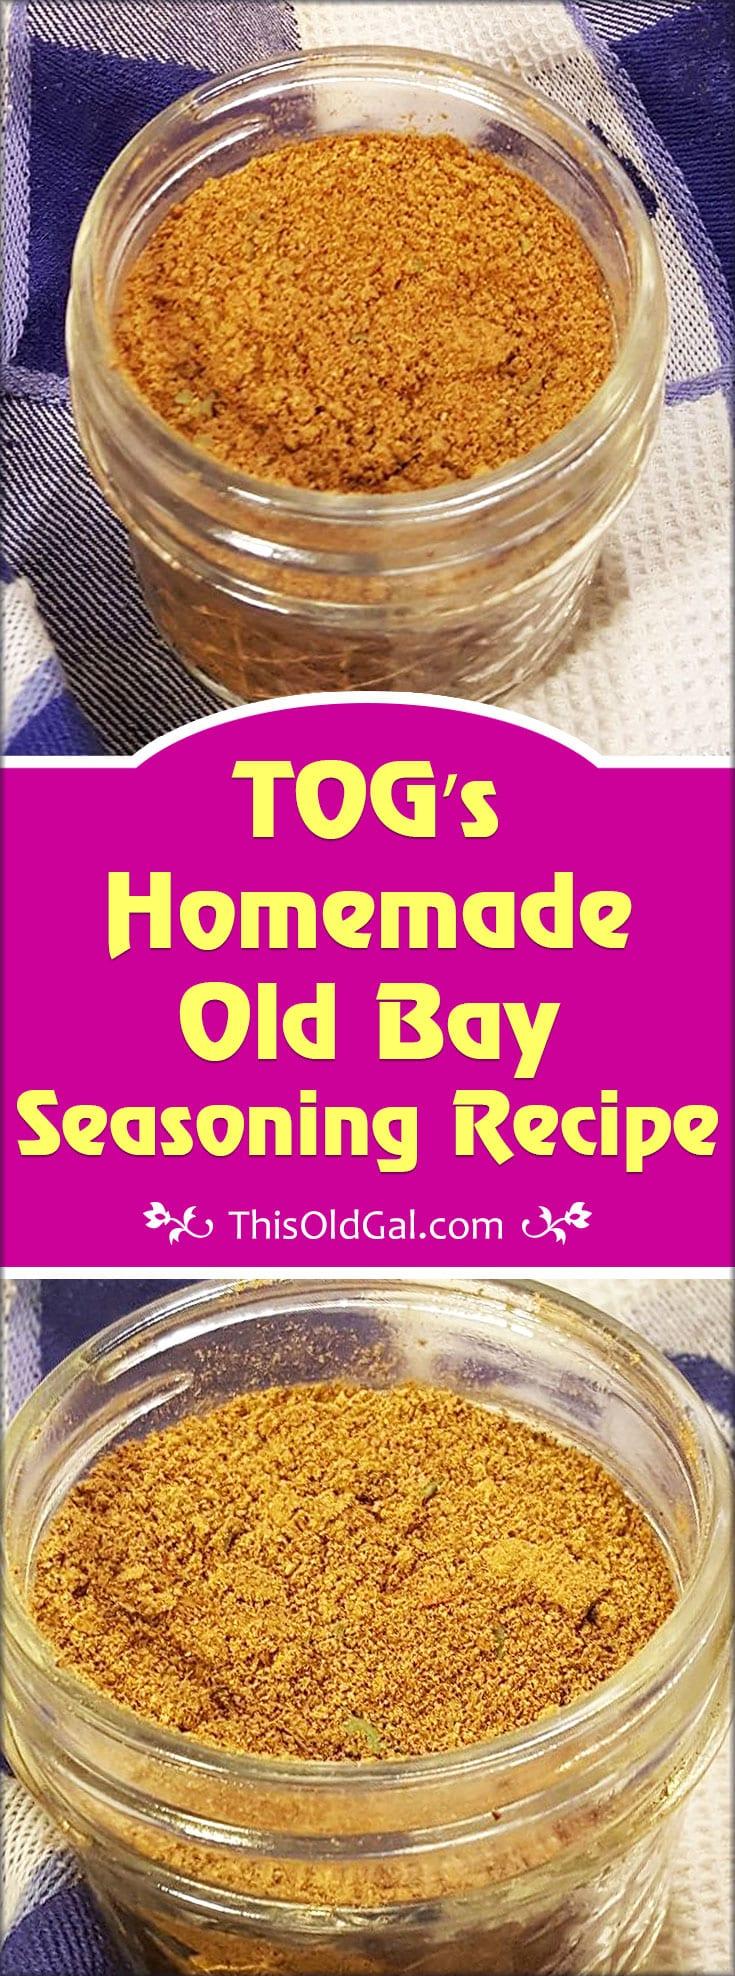 TOG's Homemade Old Bay Seasoning Recipe